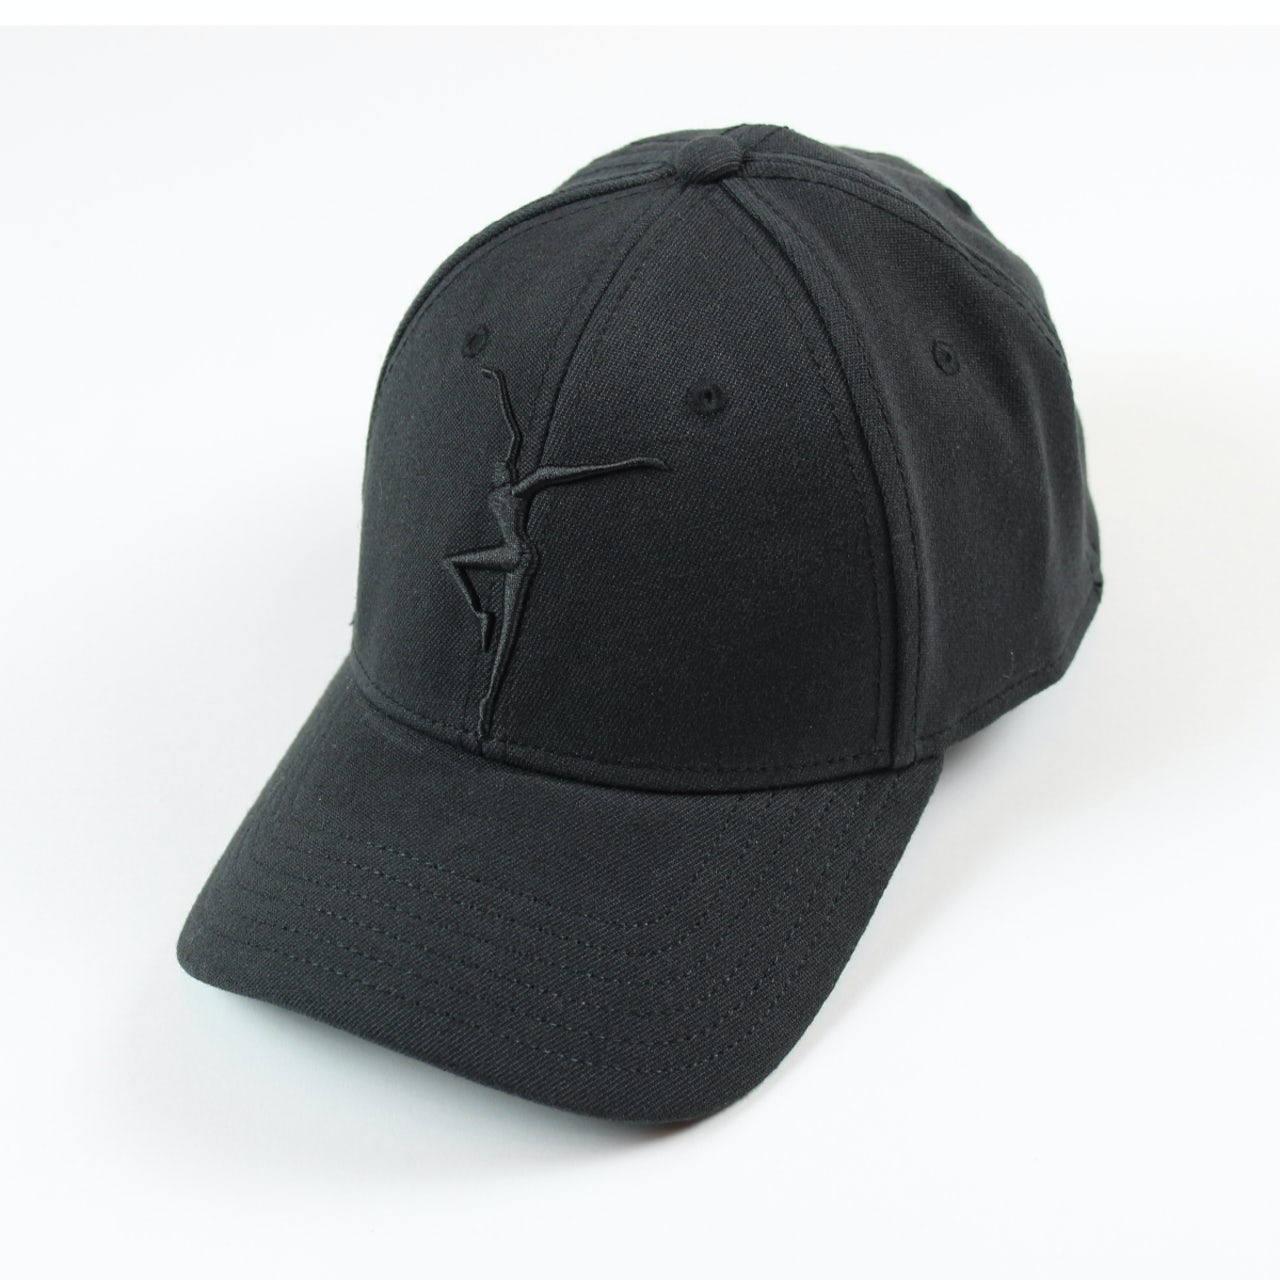 6caf9ad12 Dave Matthews Band Black Firedancer Hat